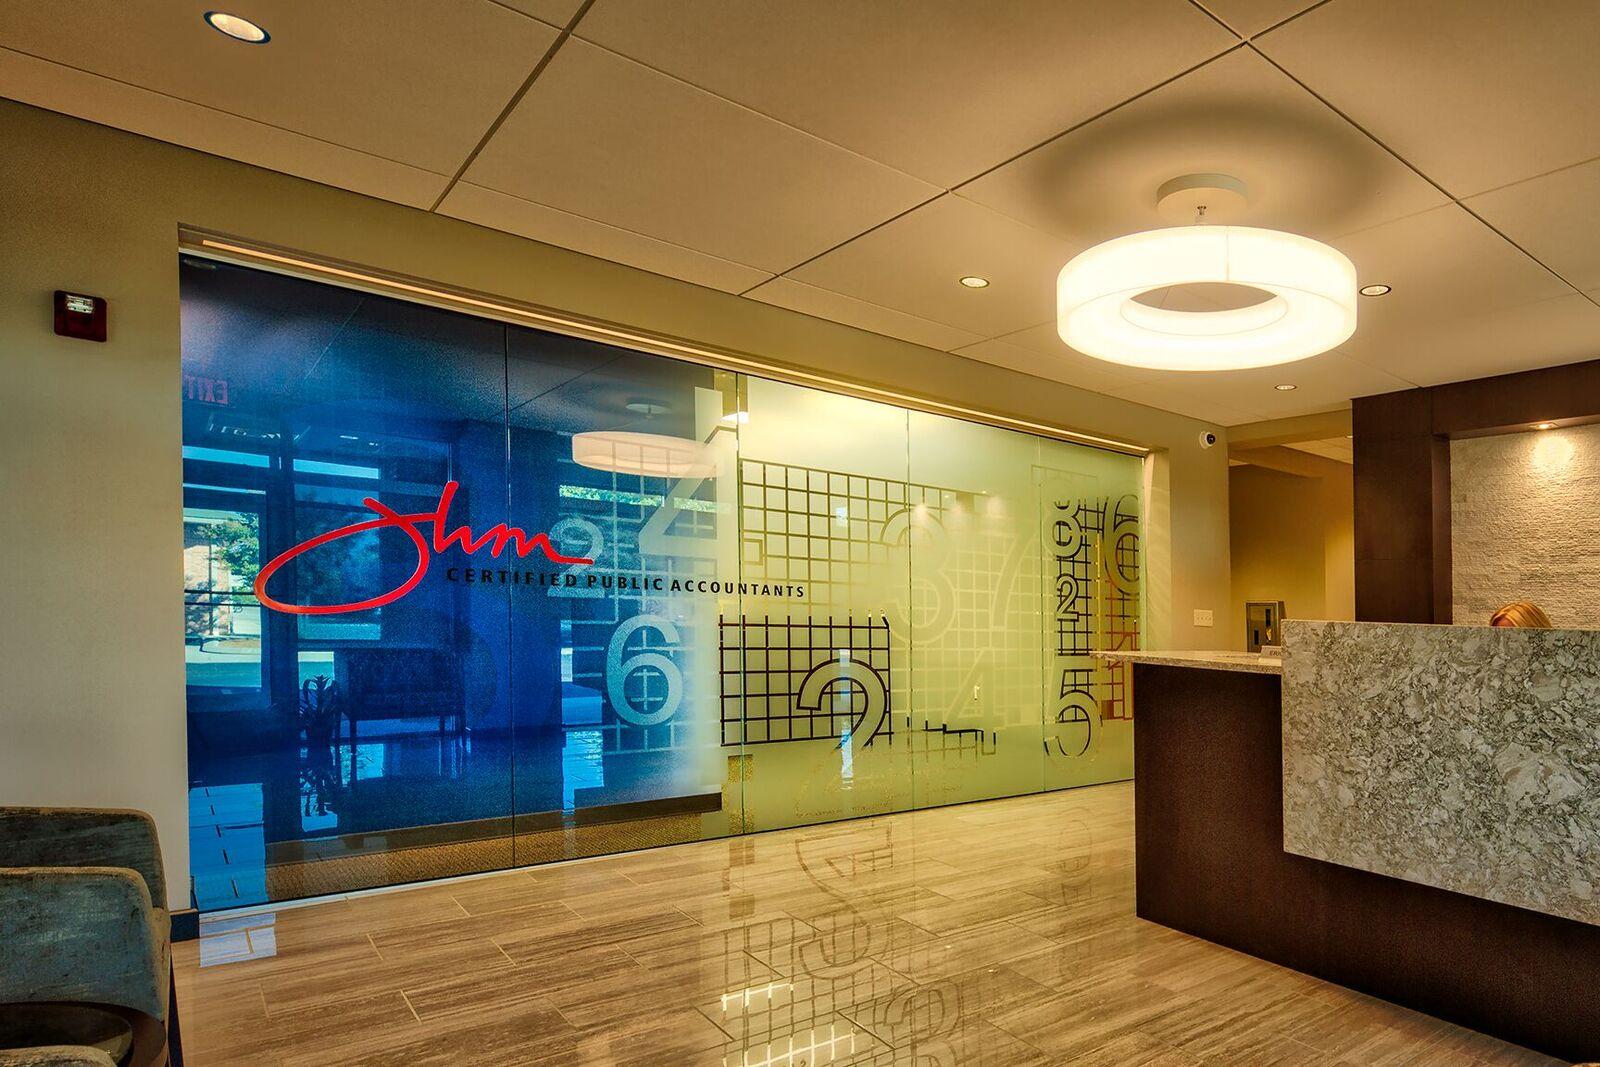 Commercial Interior Design in Chattanooga Grant Interior Design